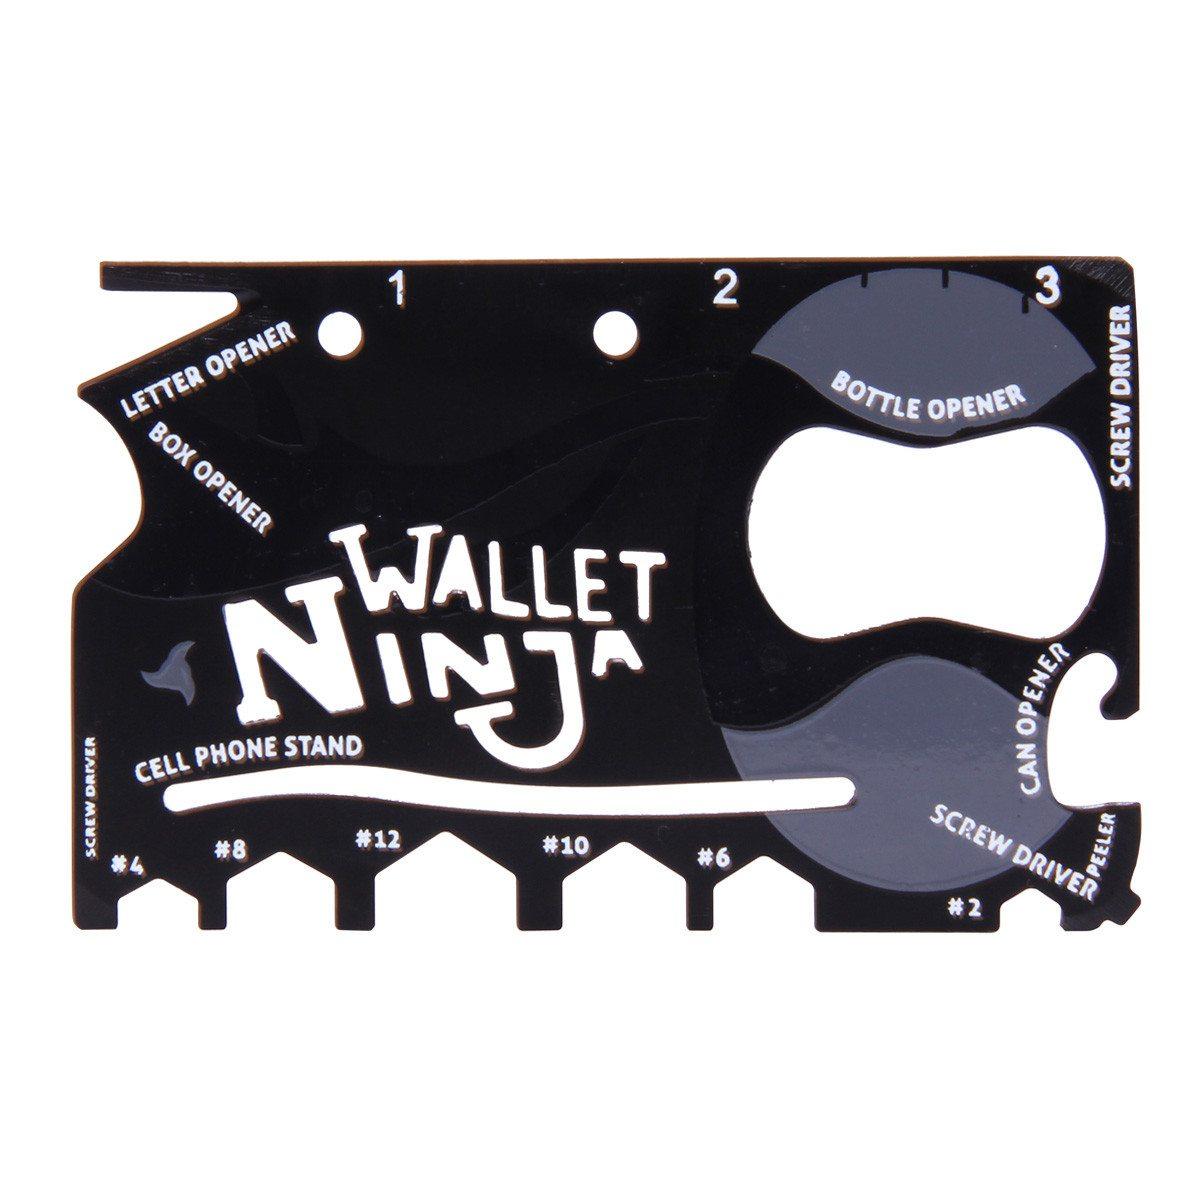 Taschen-Ninja - Das 16in1 Multitool